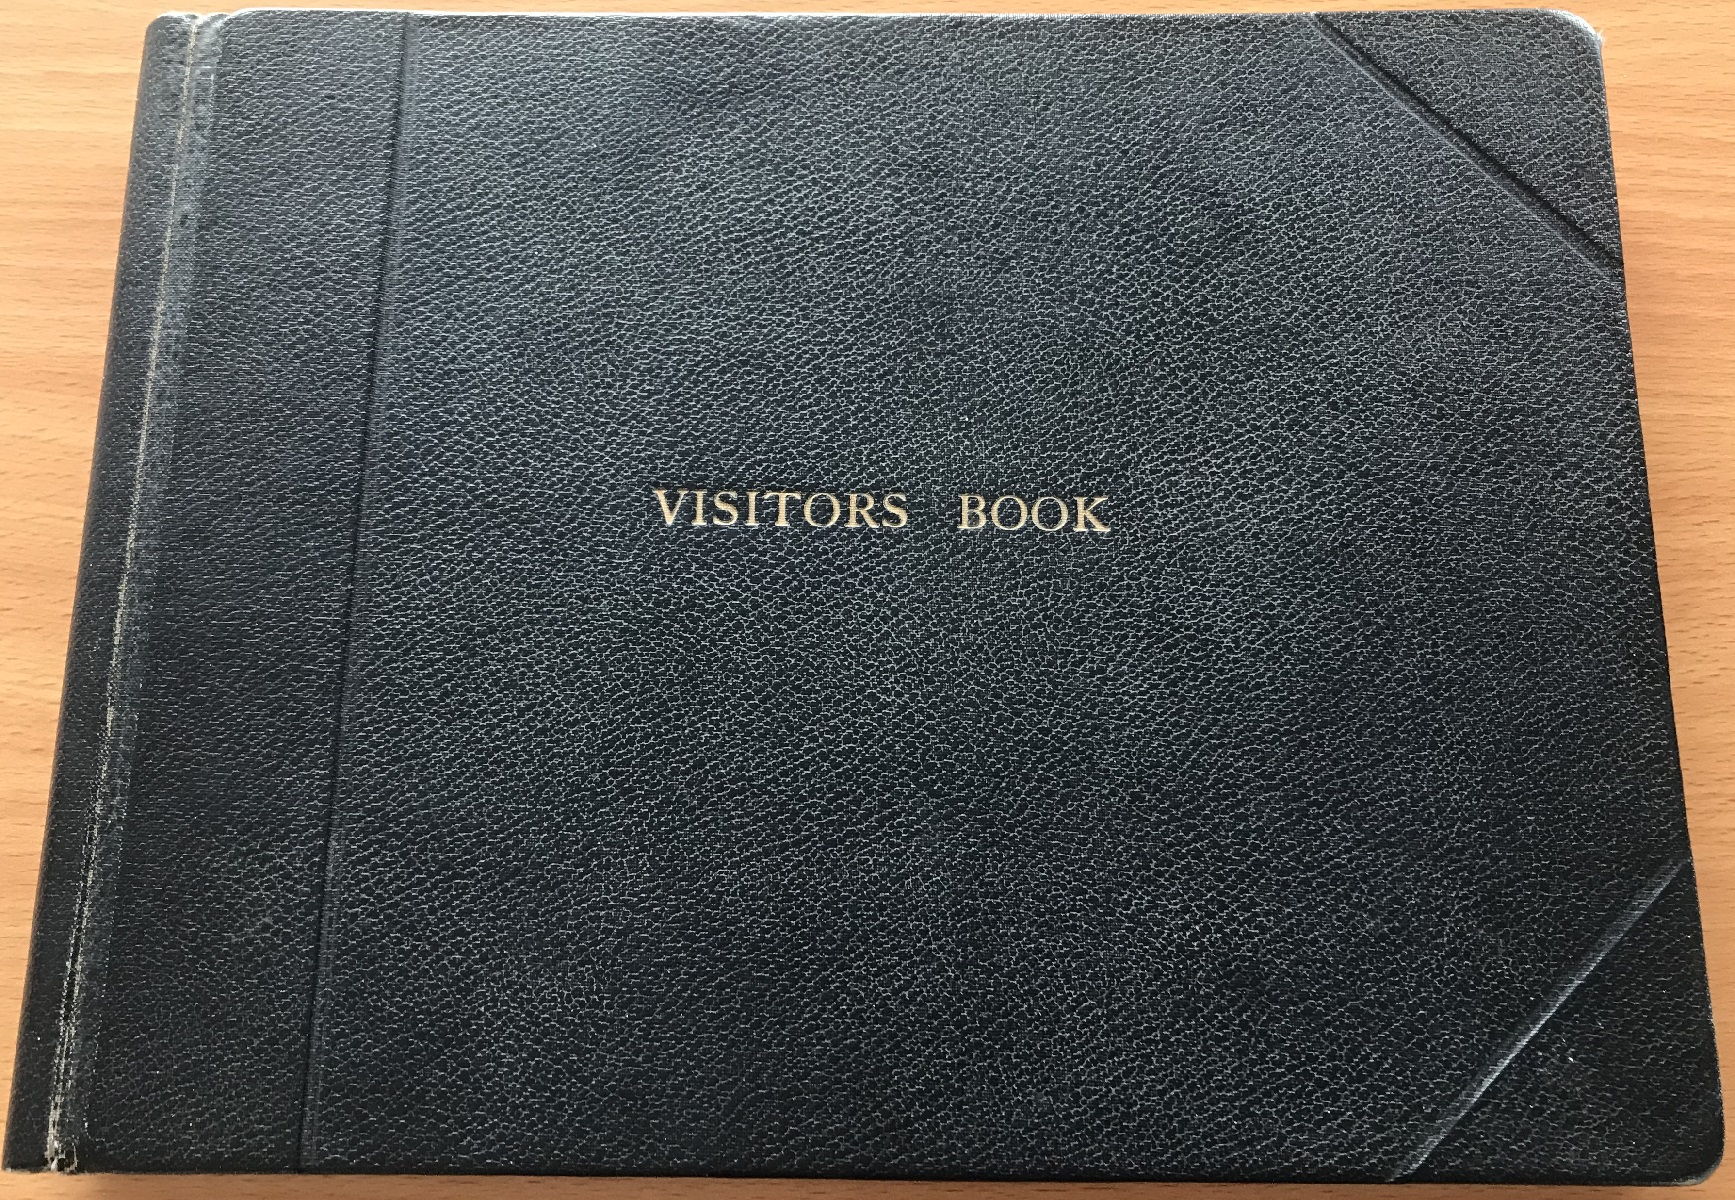 RAF Visitors Book Officers Mess EPISKOPI BFP053 dated 1965-1975 over 60 signatures some rare and